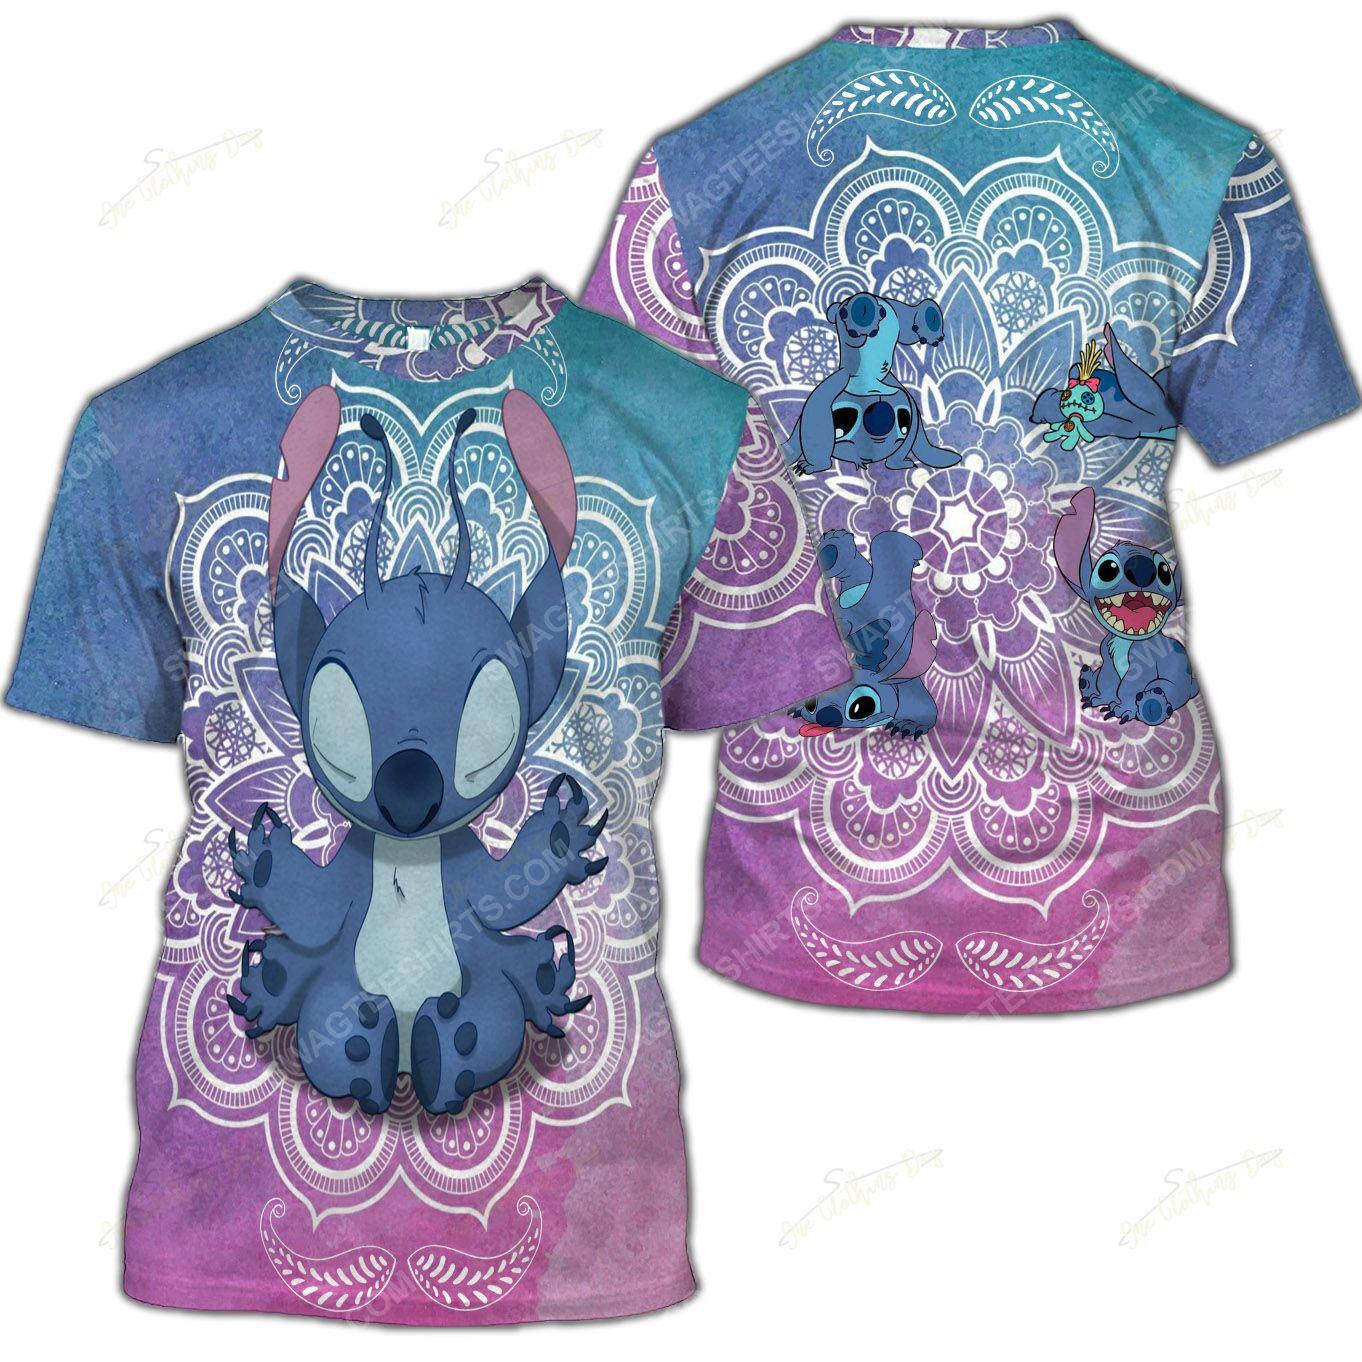 The stitch namaste full printed shirt 2(1)